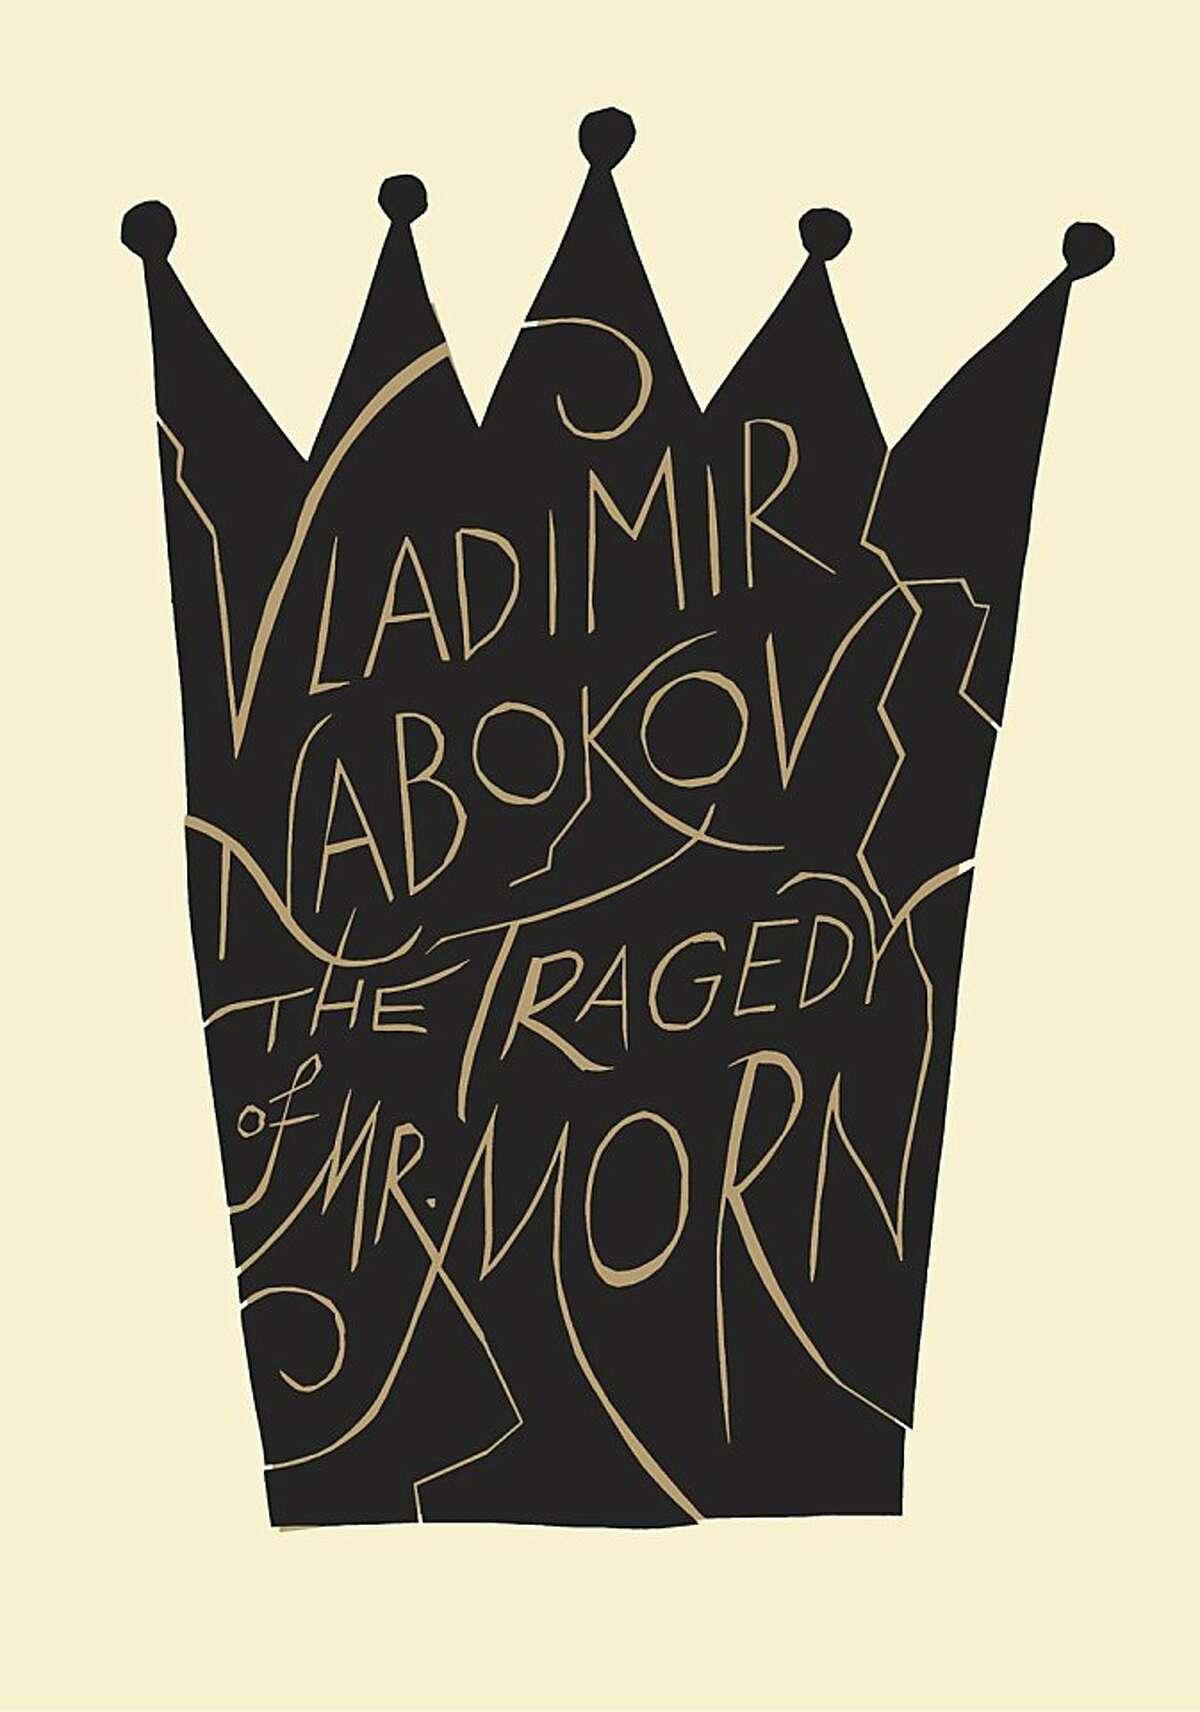 The Tragedy of Mister Morn, by Vladimir Nabokov